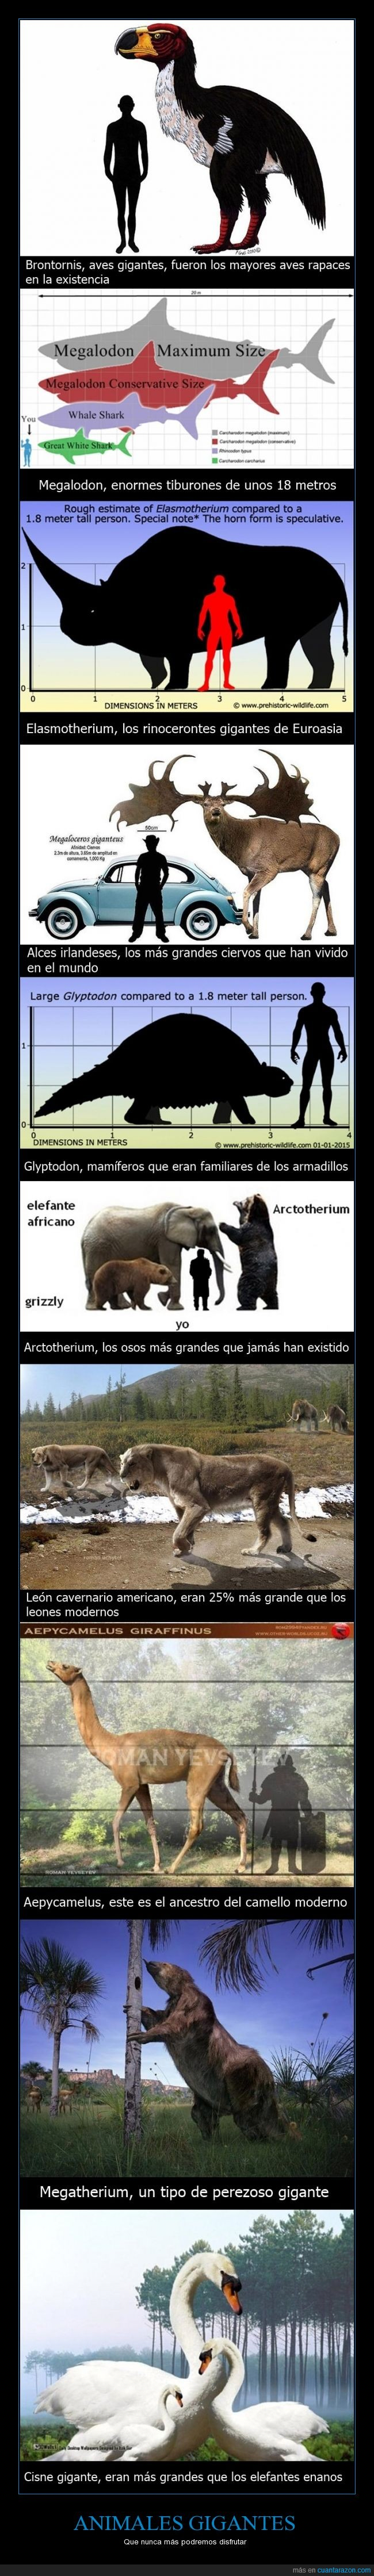 Aepycamelus,alces,animales extintos,Arctotherium,armadillos,aves rapaces,Brontornis,camello moderno,Cisne,comparación,desaparecidos,Elasmotherium,Euroasia,Glyptodon,León cavernario americano,Megalodon,Megatherium,osos,perezoso gigante,rinocerontes,tiburones